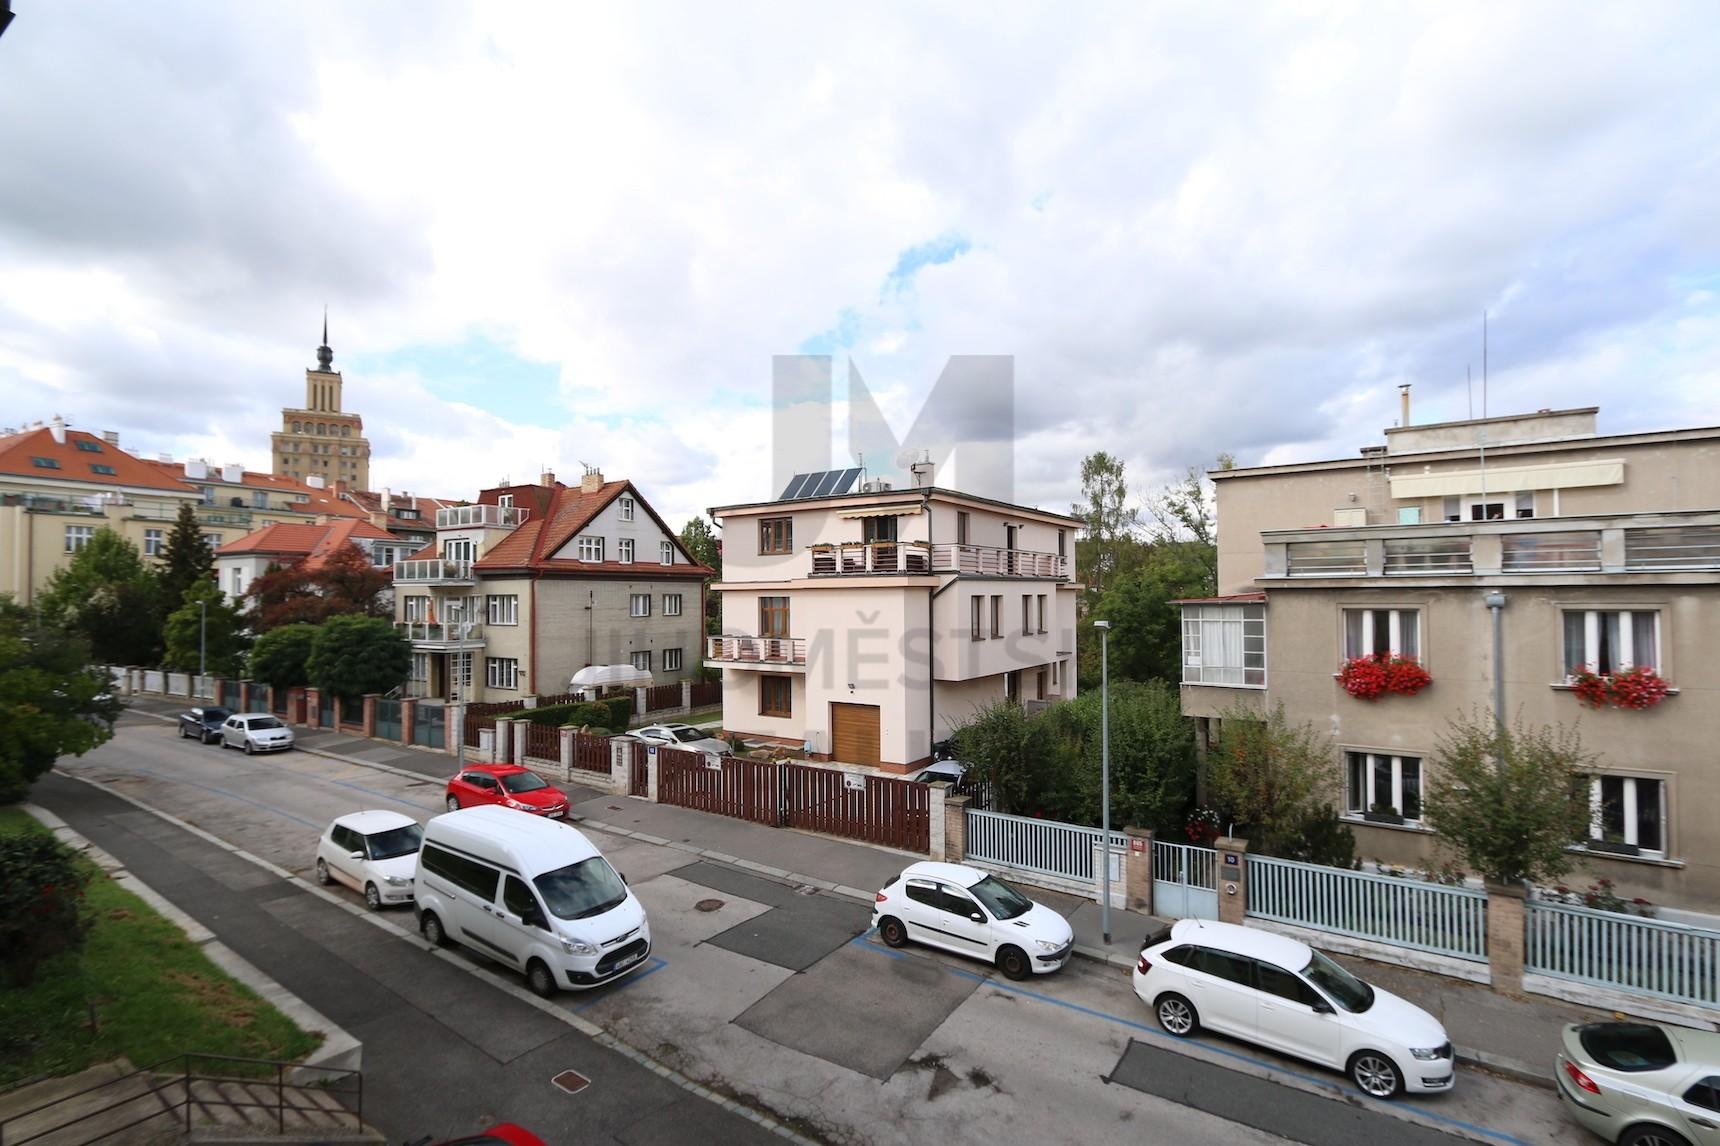 PRODEJ BYTU 3+1 S LODŽIÍ A GAR. STÁNÍM, Čínská, Praha 6 - Bubeneč